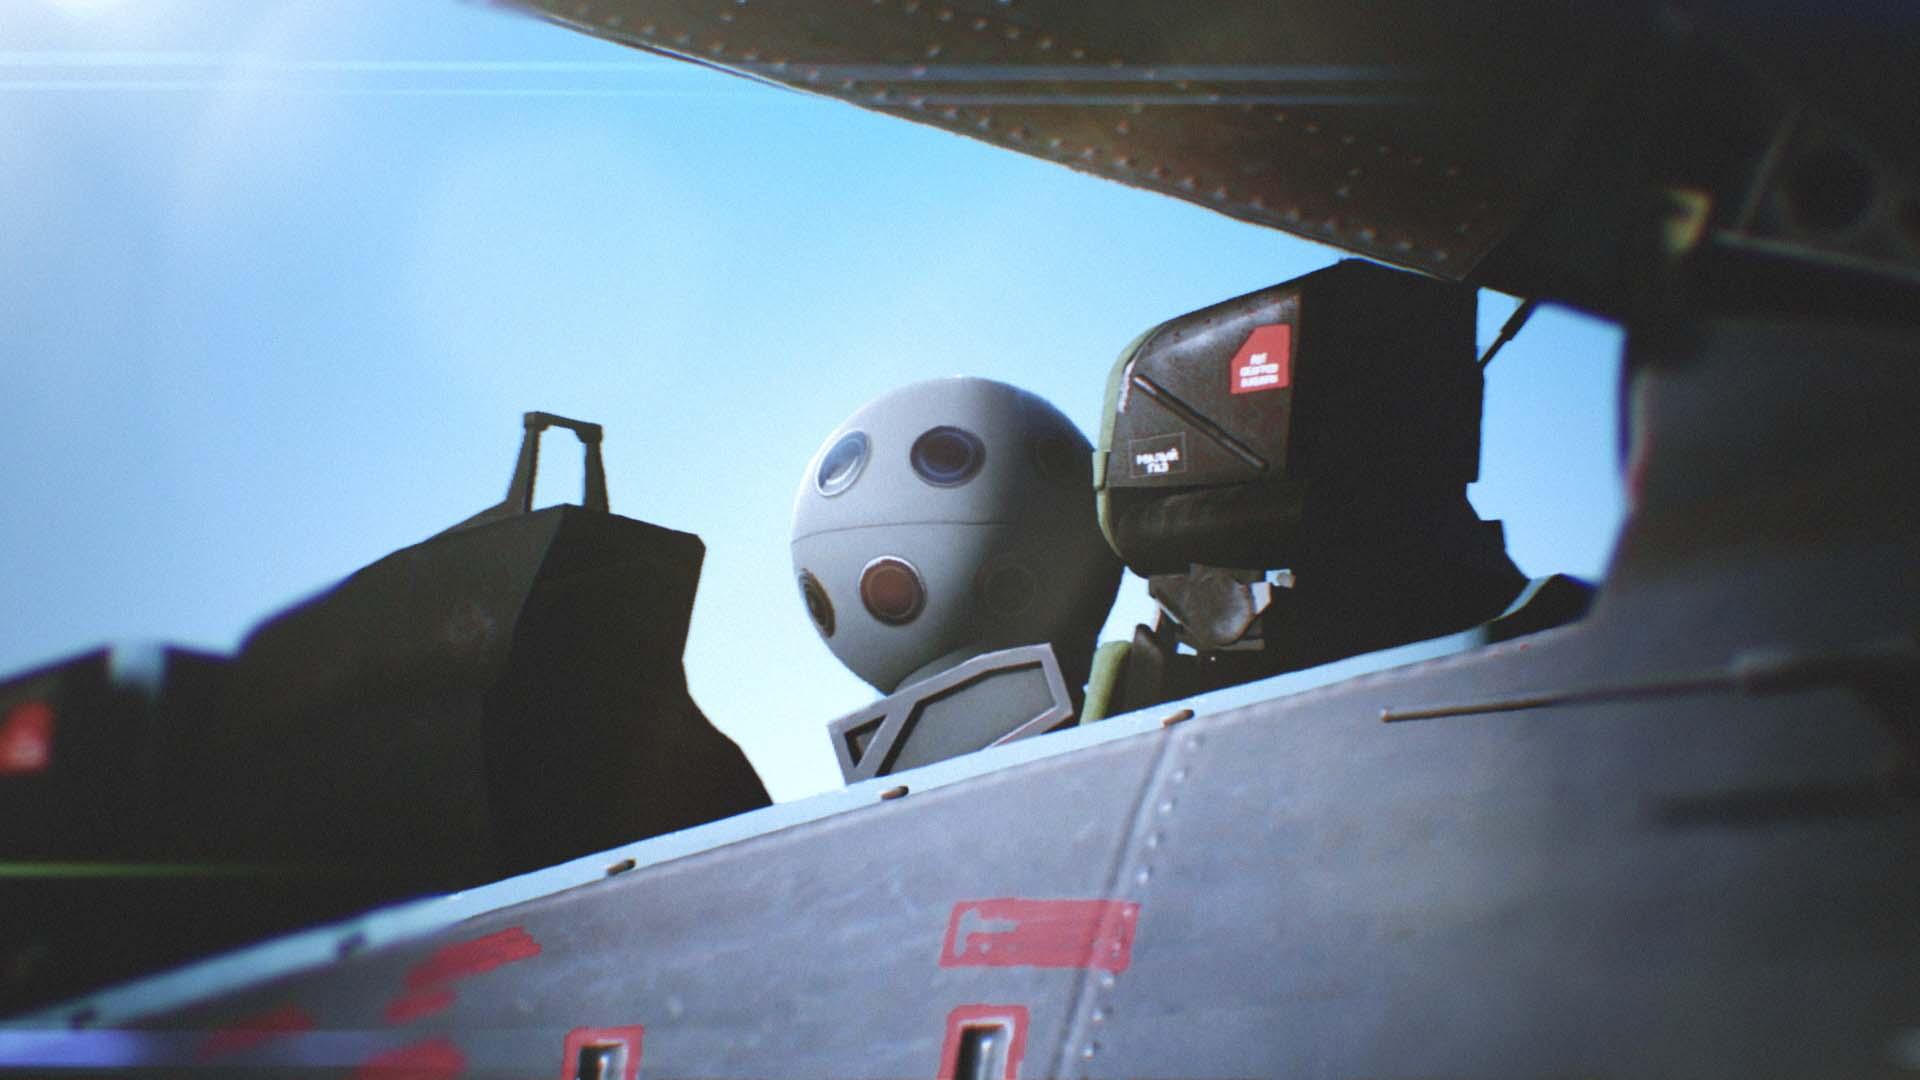 ace-combat-7-08-22-17-12.jpg